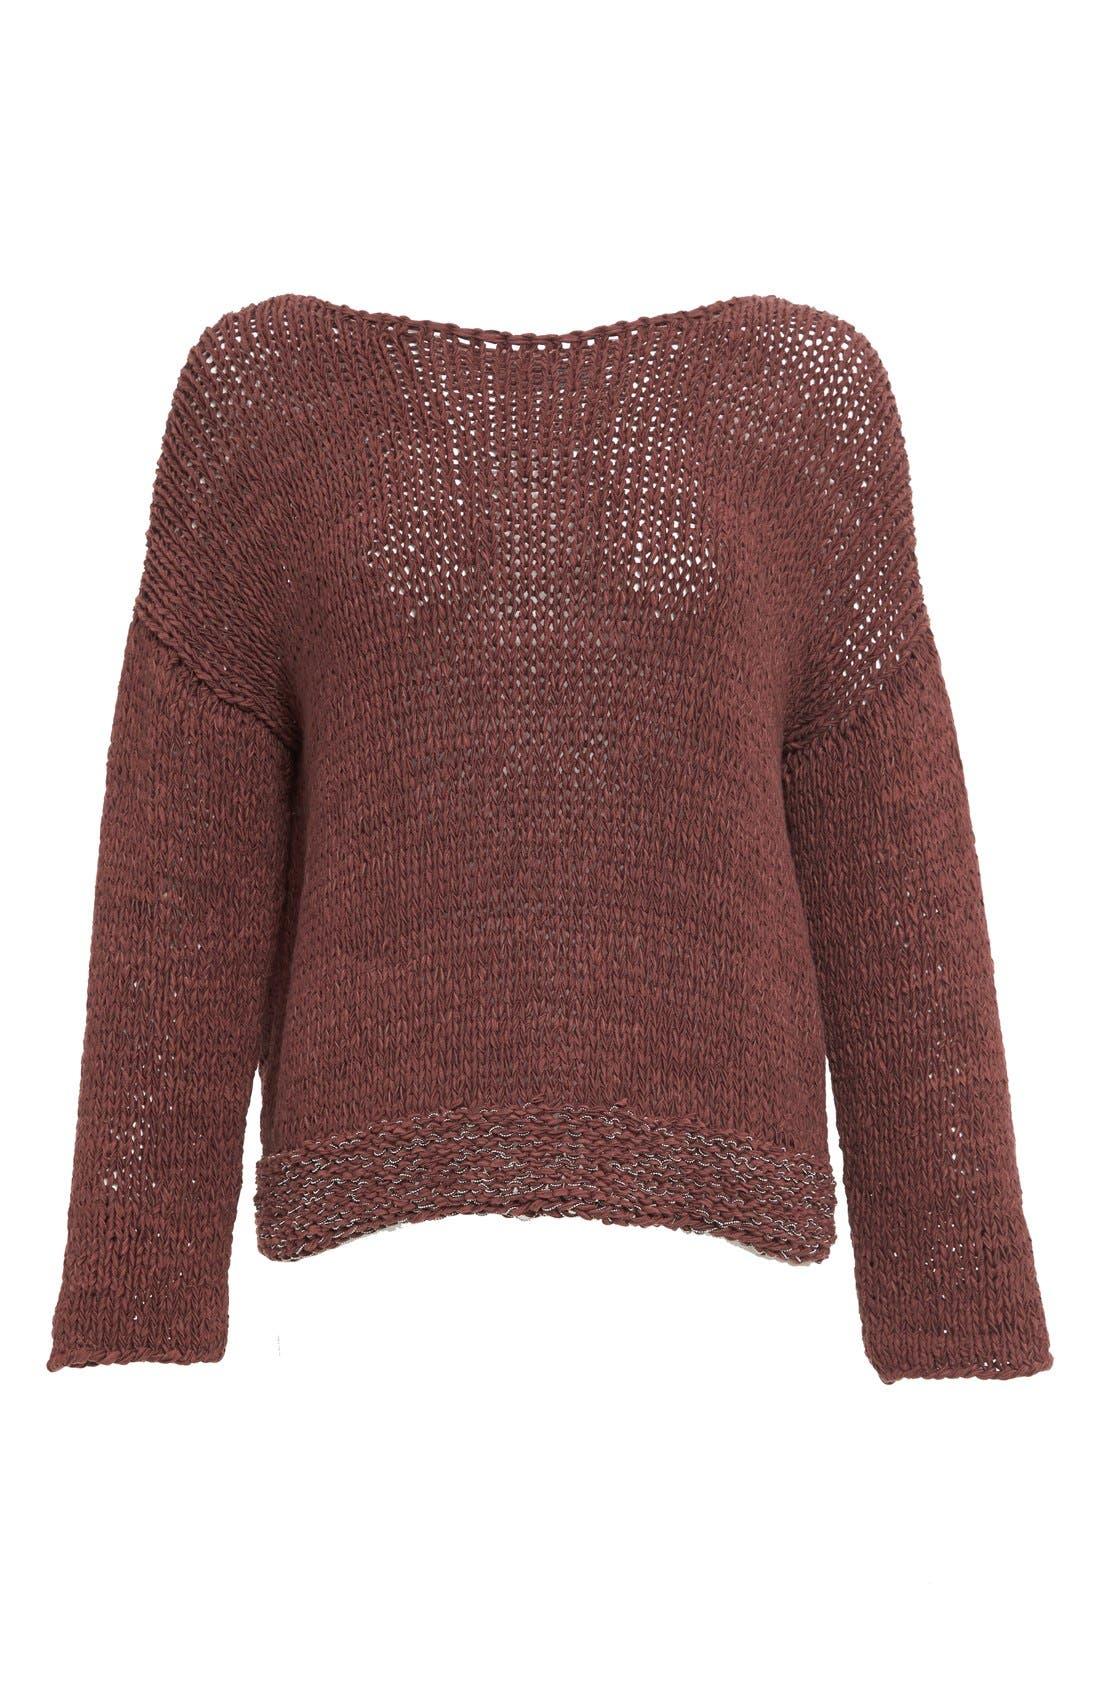 Alternate Image 4  - Fabiana Filippi Mollini Trim Cotton Blend Sweater